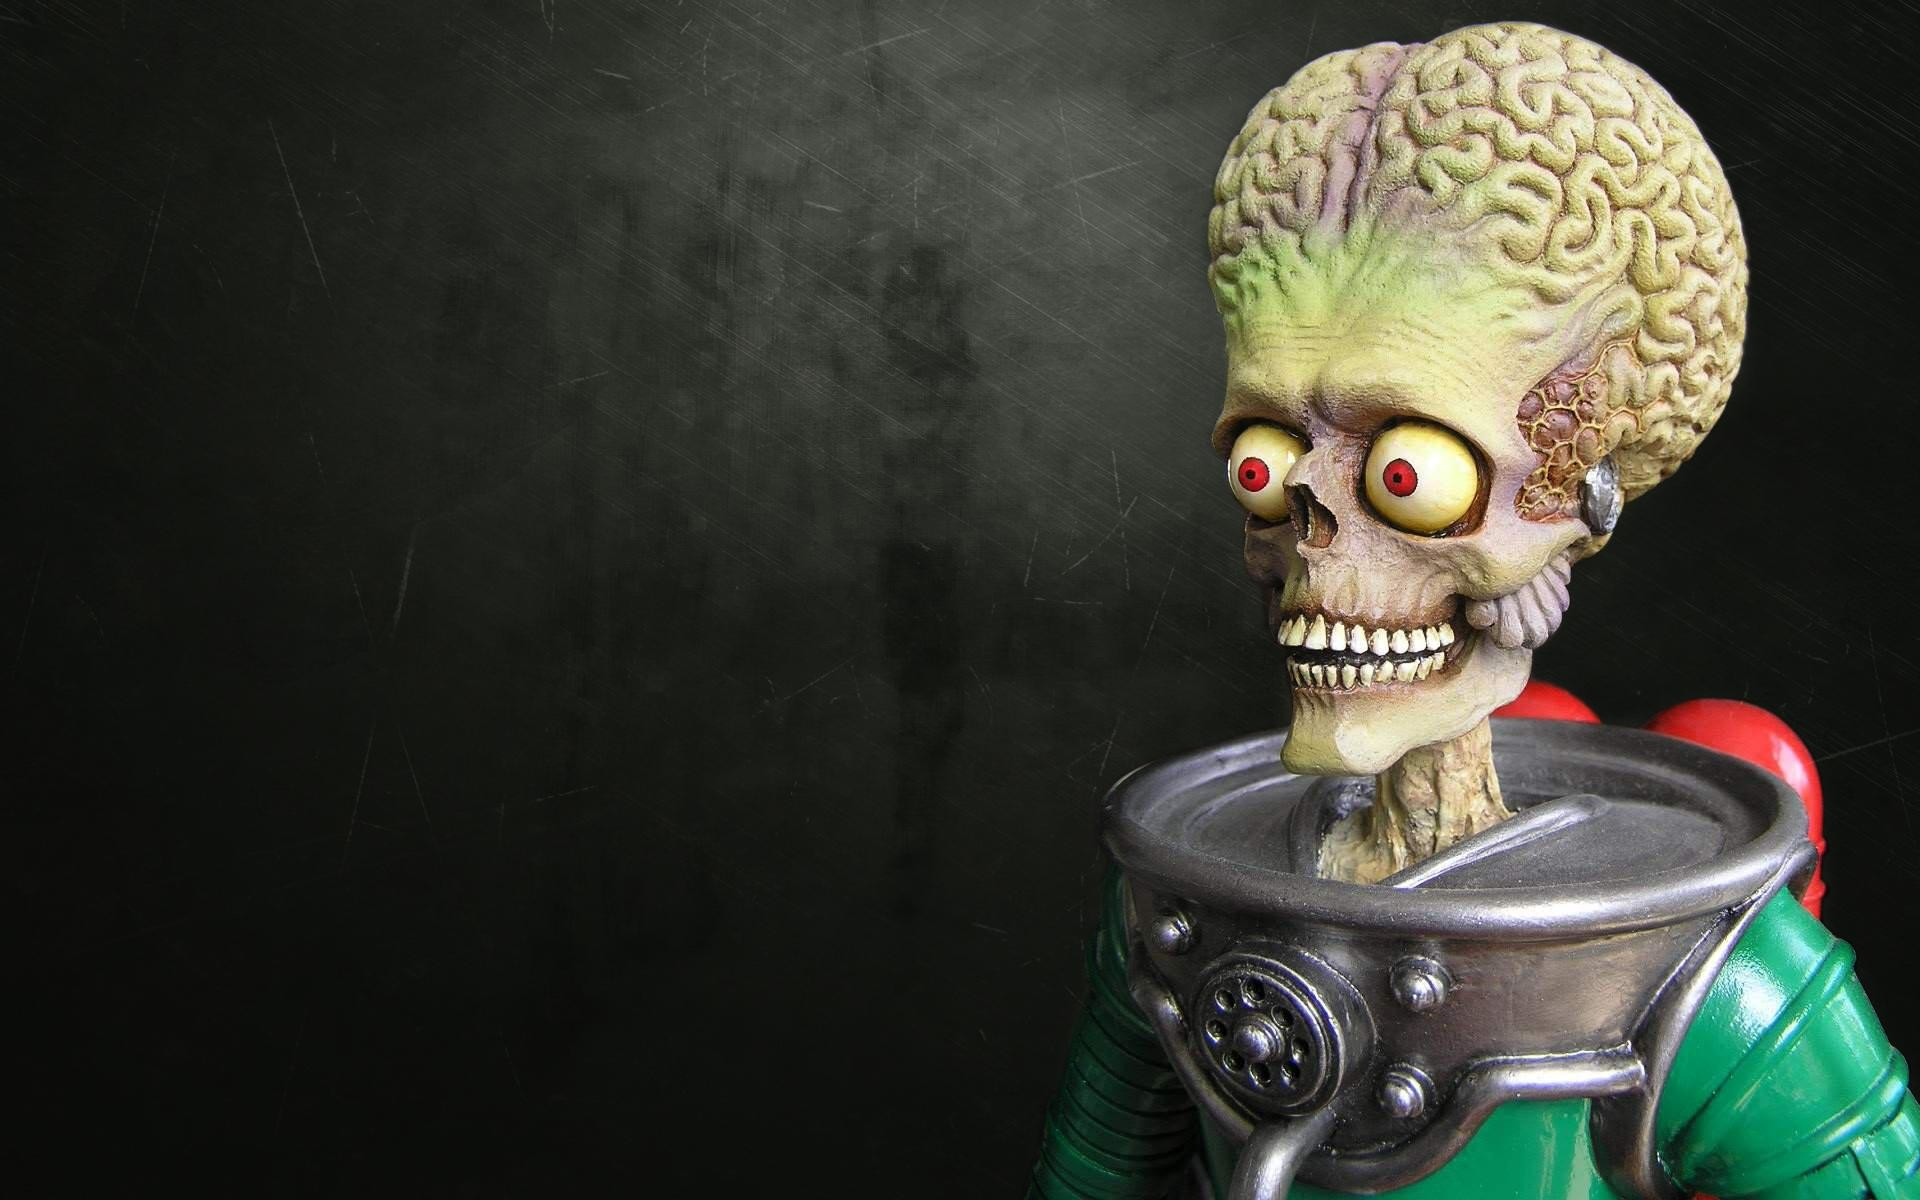 Mars Attacks Sci Fi Alien Creature Monster Skull Eyes Dark Horror Scary  Creepy Spooky Astronaut HD Widescreen